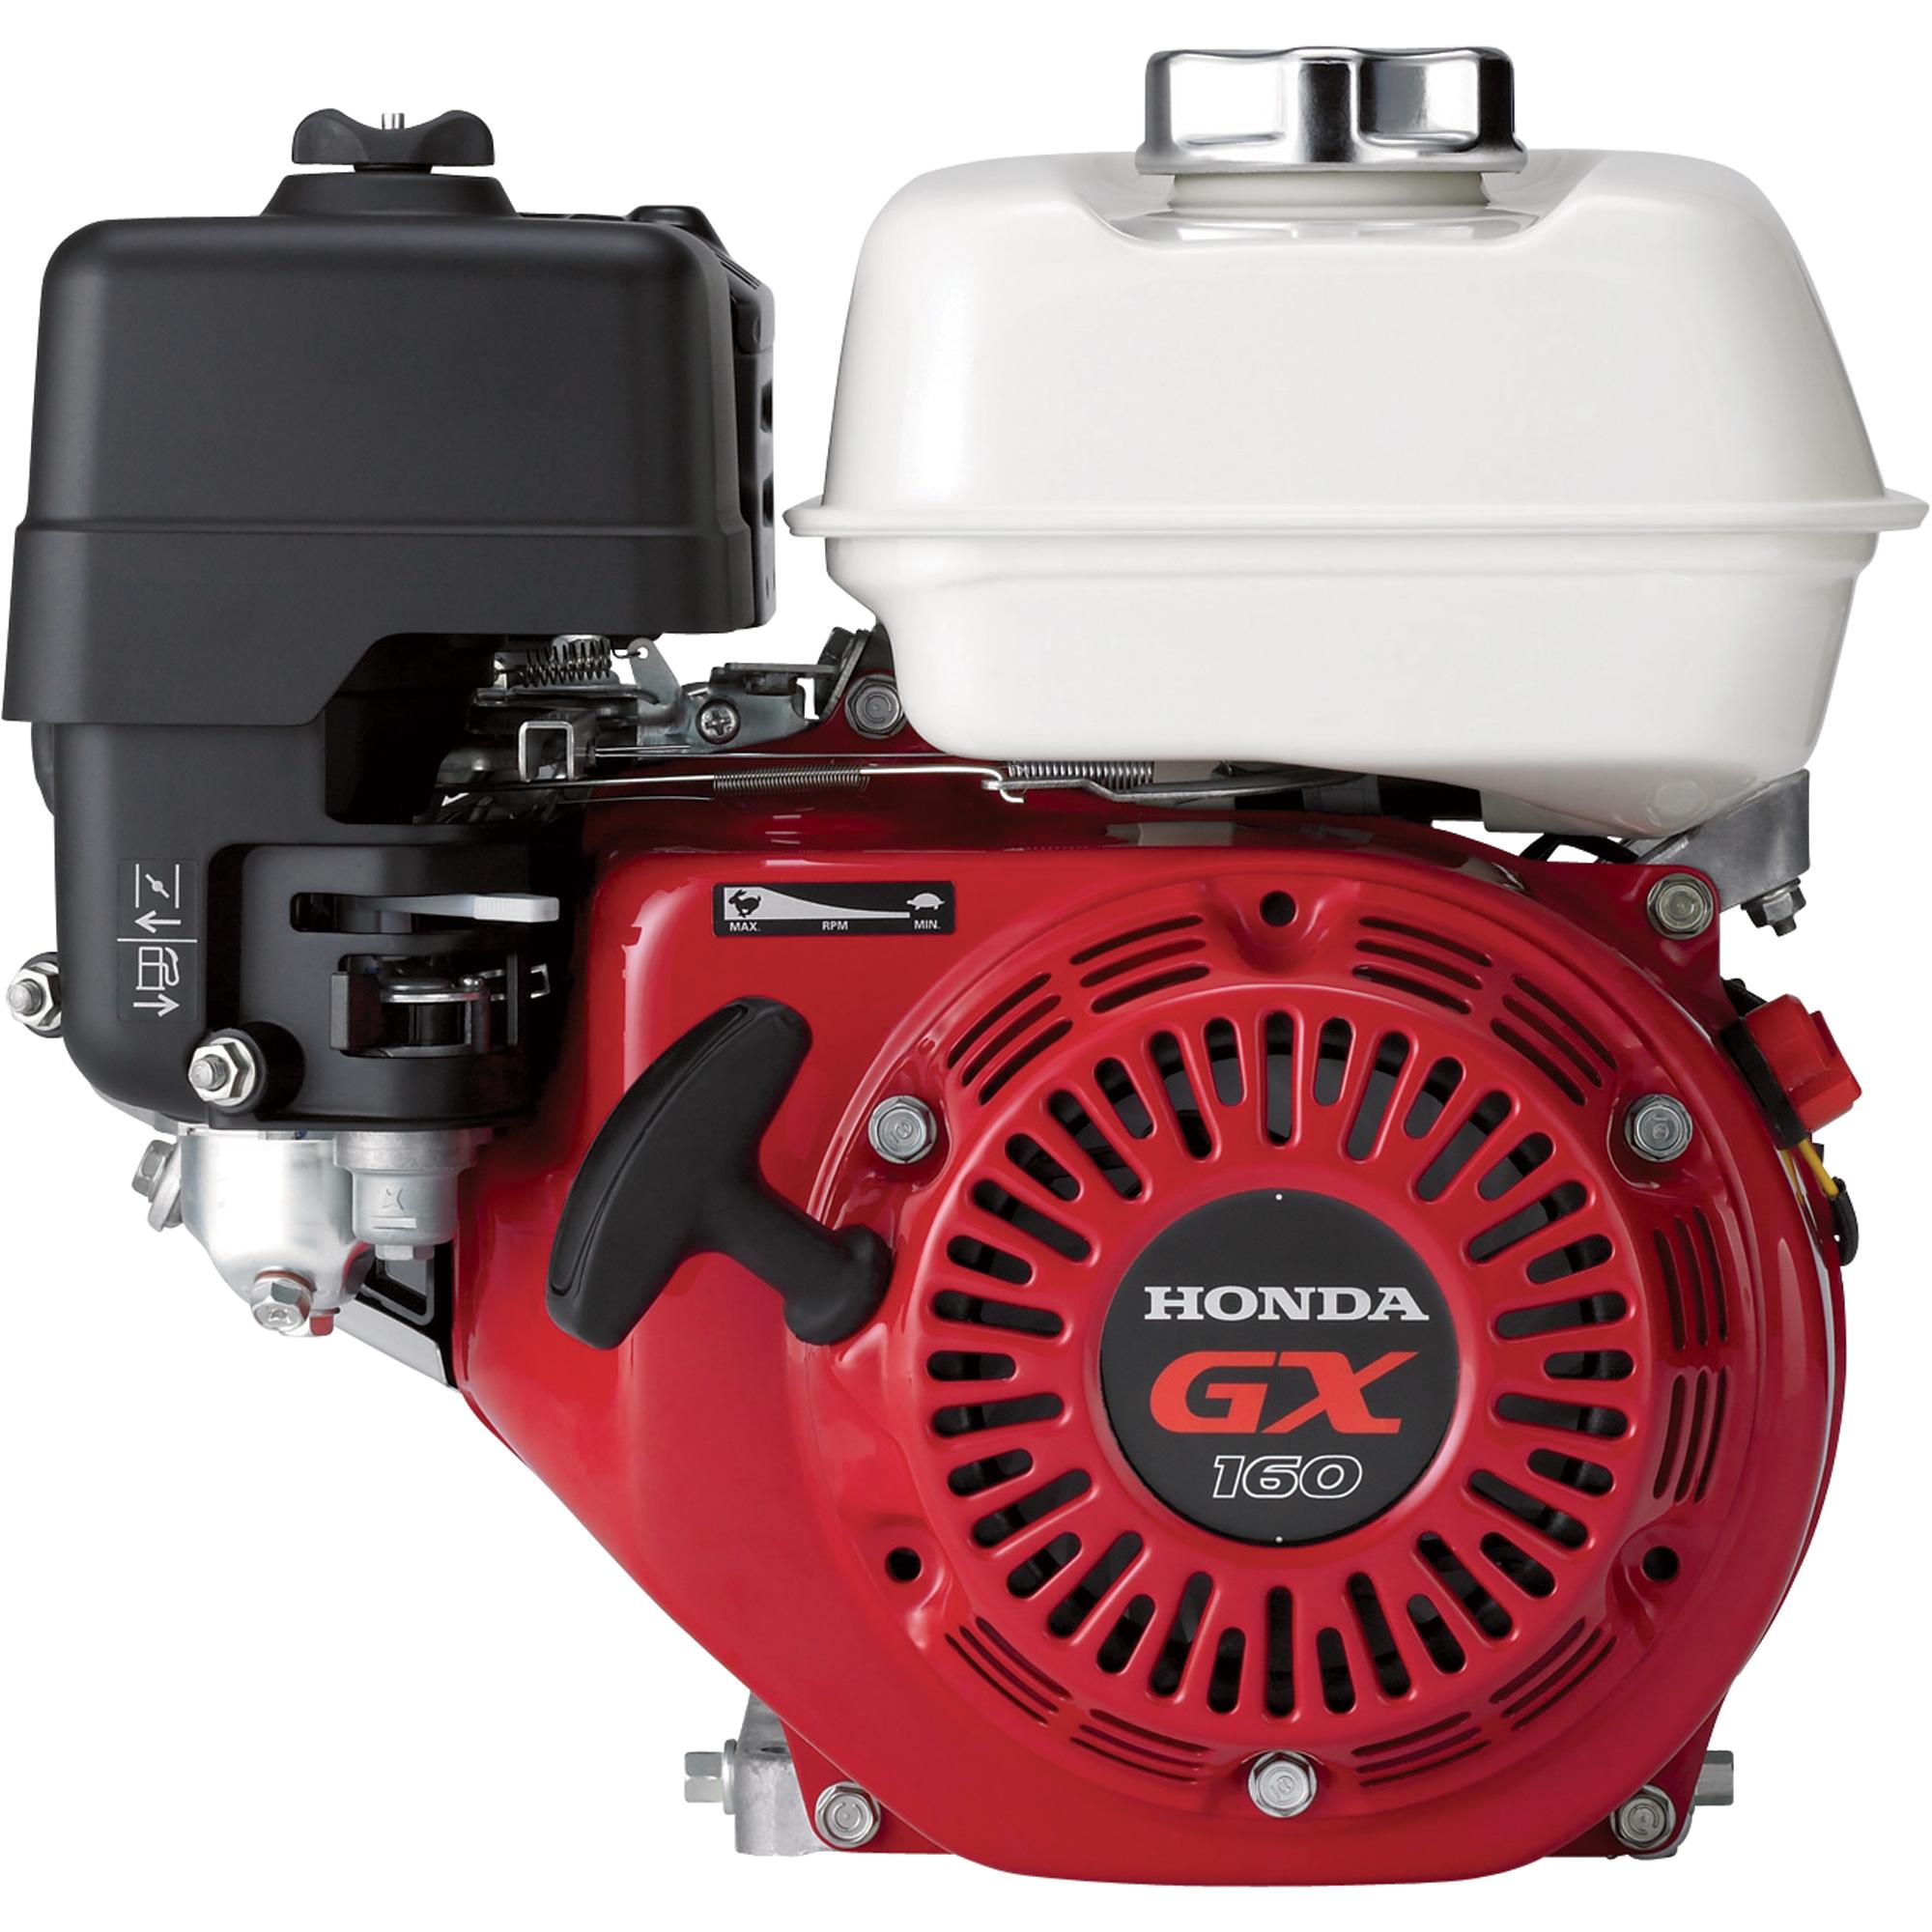 Honda 11 Hp Engine Diagram Manual Guide Wiring Hrb217 Hxa Lawn Mower Usa Vin Maea1000001 Carburetor Gs Overview Parts Blog Rh Hondalawnparts Com Gx340